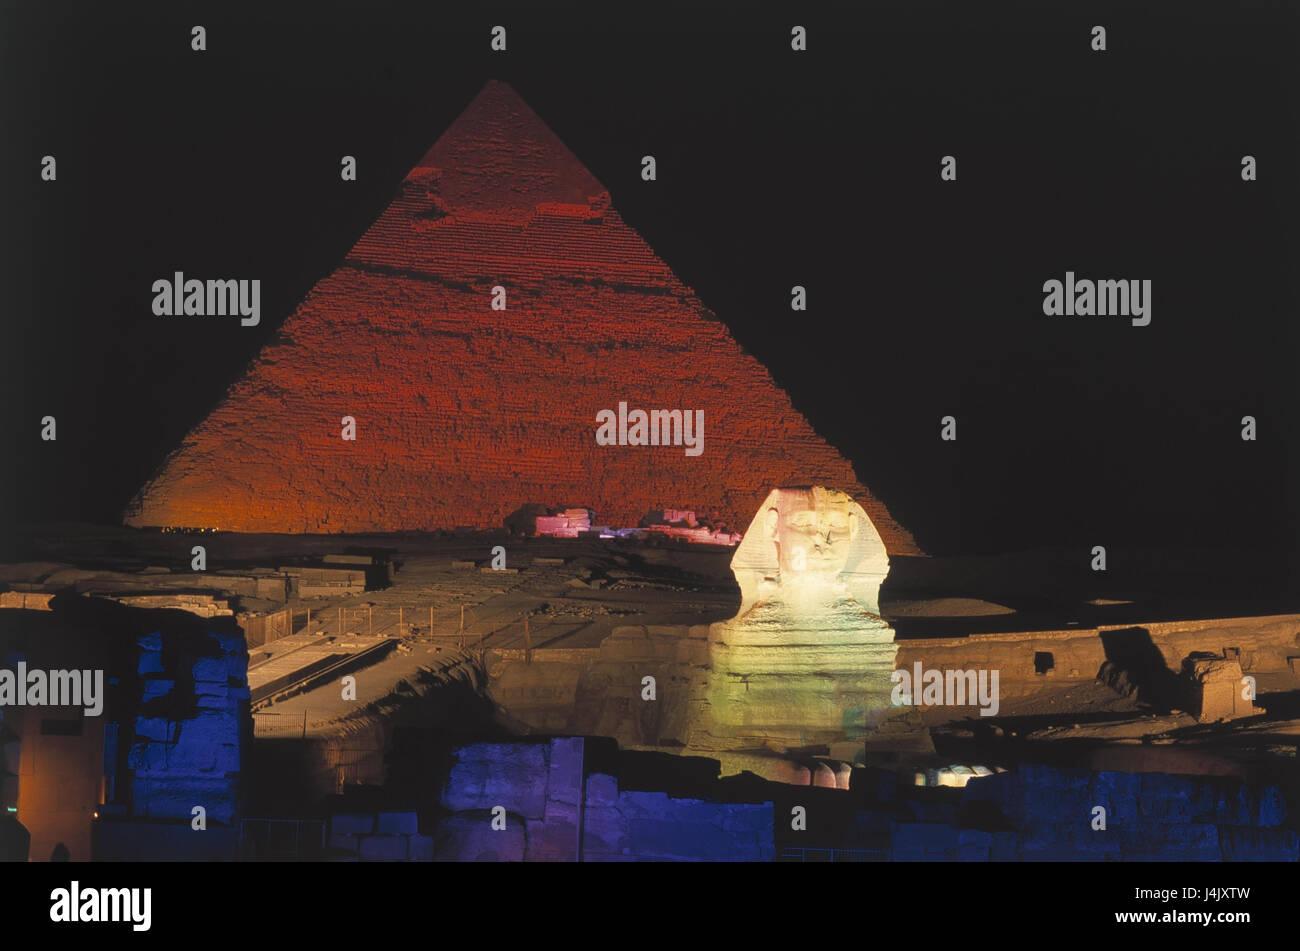 Egypt, Gizeh, pyramids, sphinx, illuminateds, night outside, Africa, East, Giseh, Gise, Giza, Al-Giza, El-Giseh, - Stock Image